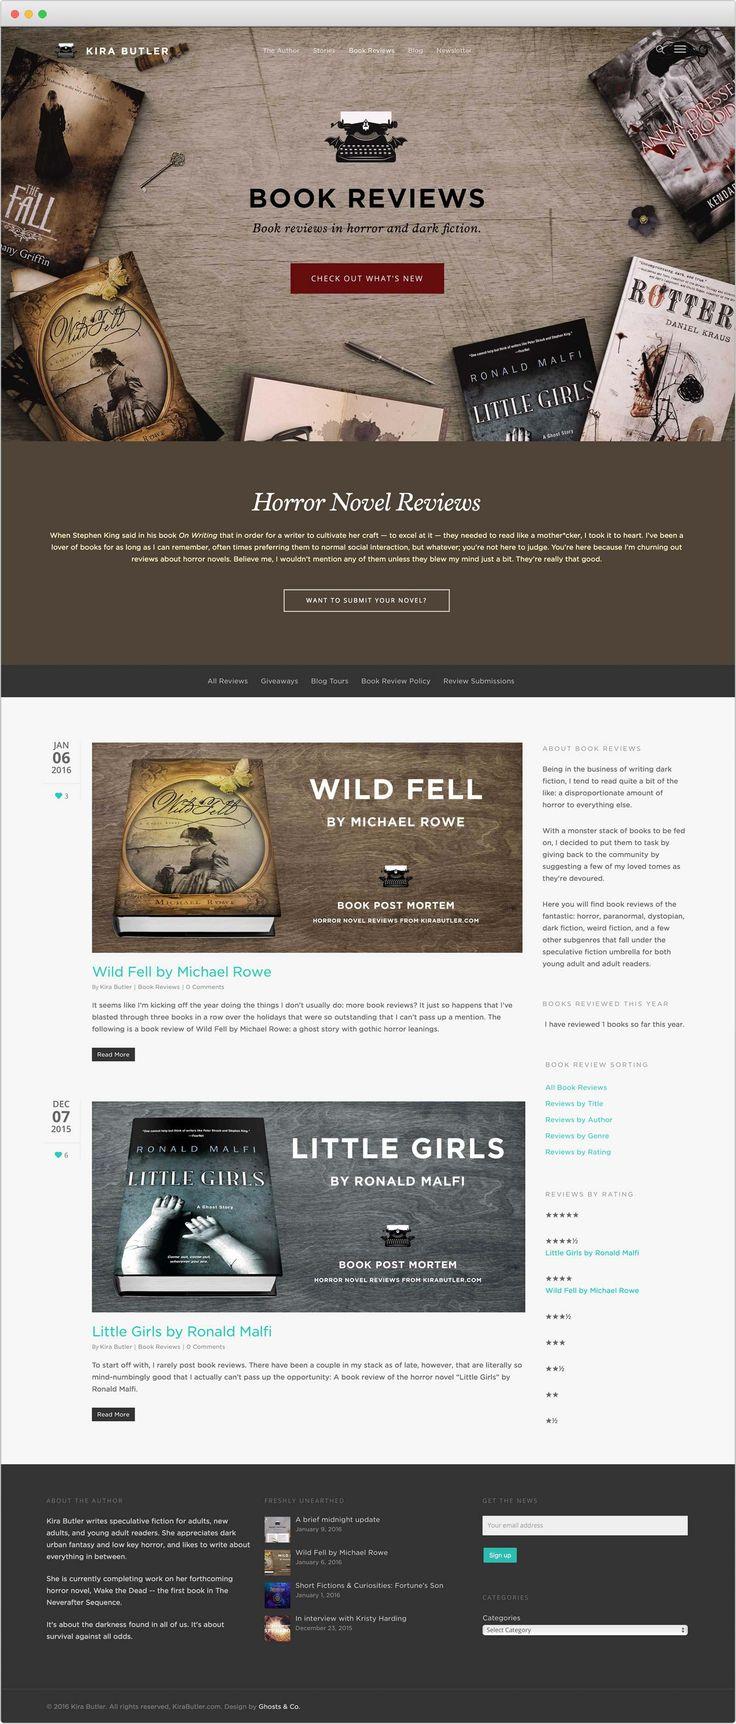 KiraButler.com Book Reviews in Horror and Dark Fiction Website